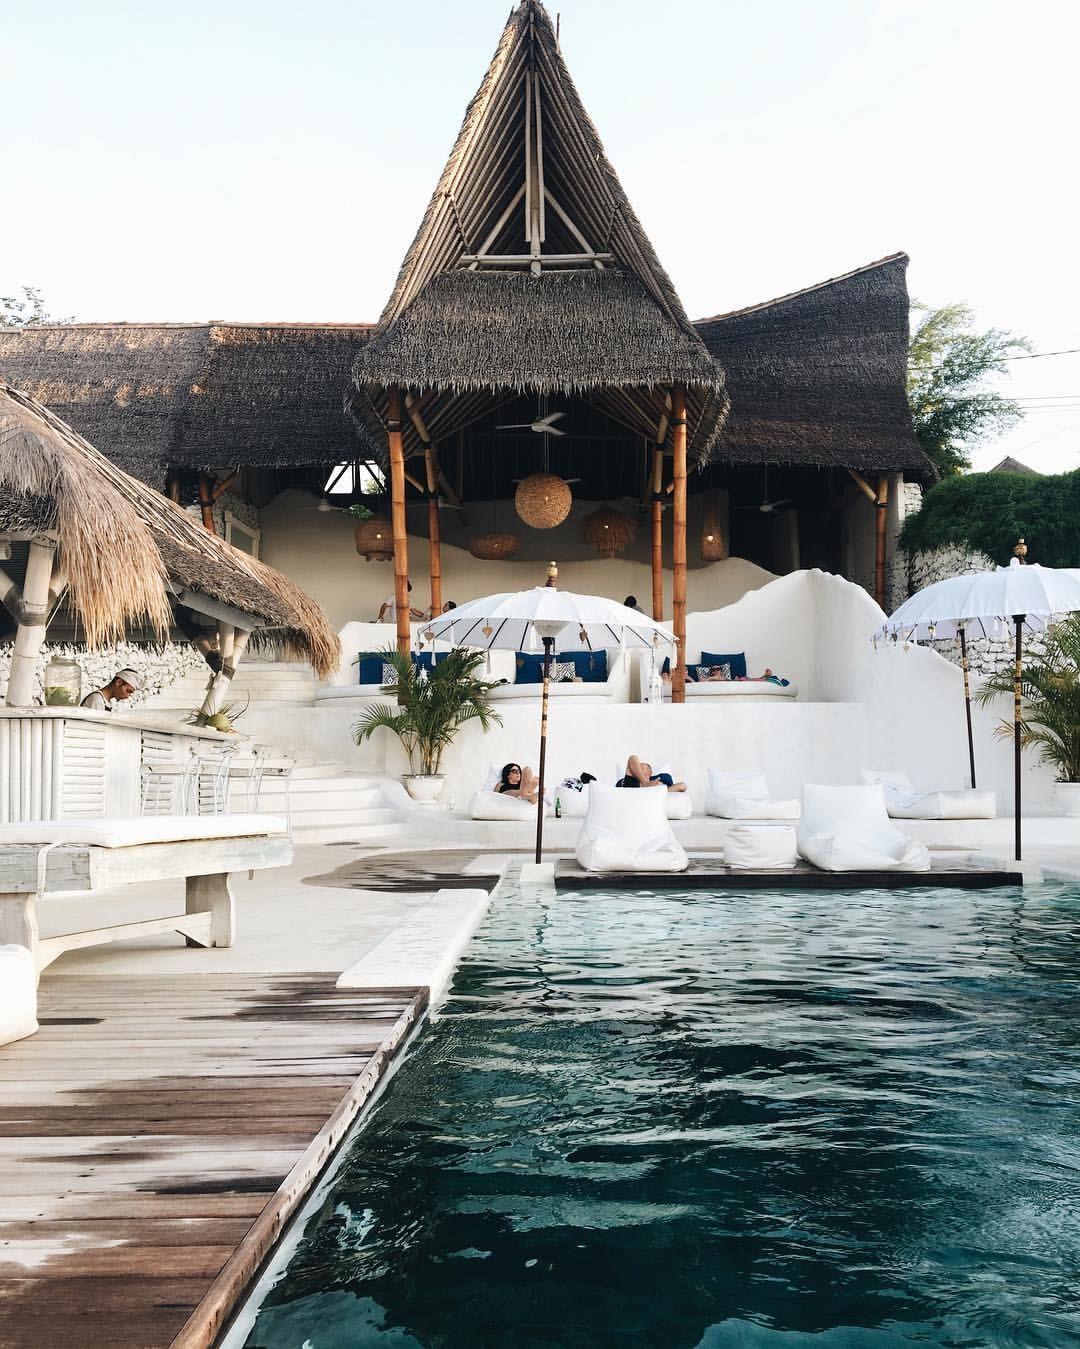 See This Instagram Photo By Sweetdreamphotography Gravity Bar Hotel Uluwatu Bali Bali Holidays Bali Beach Hotels